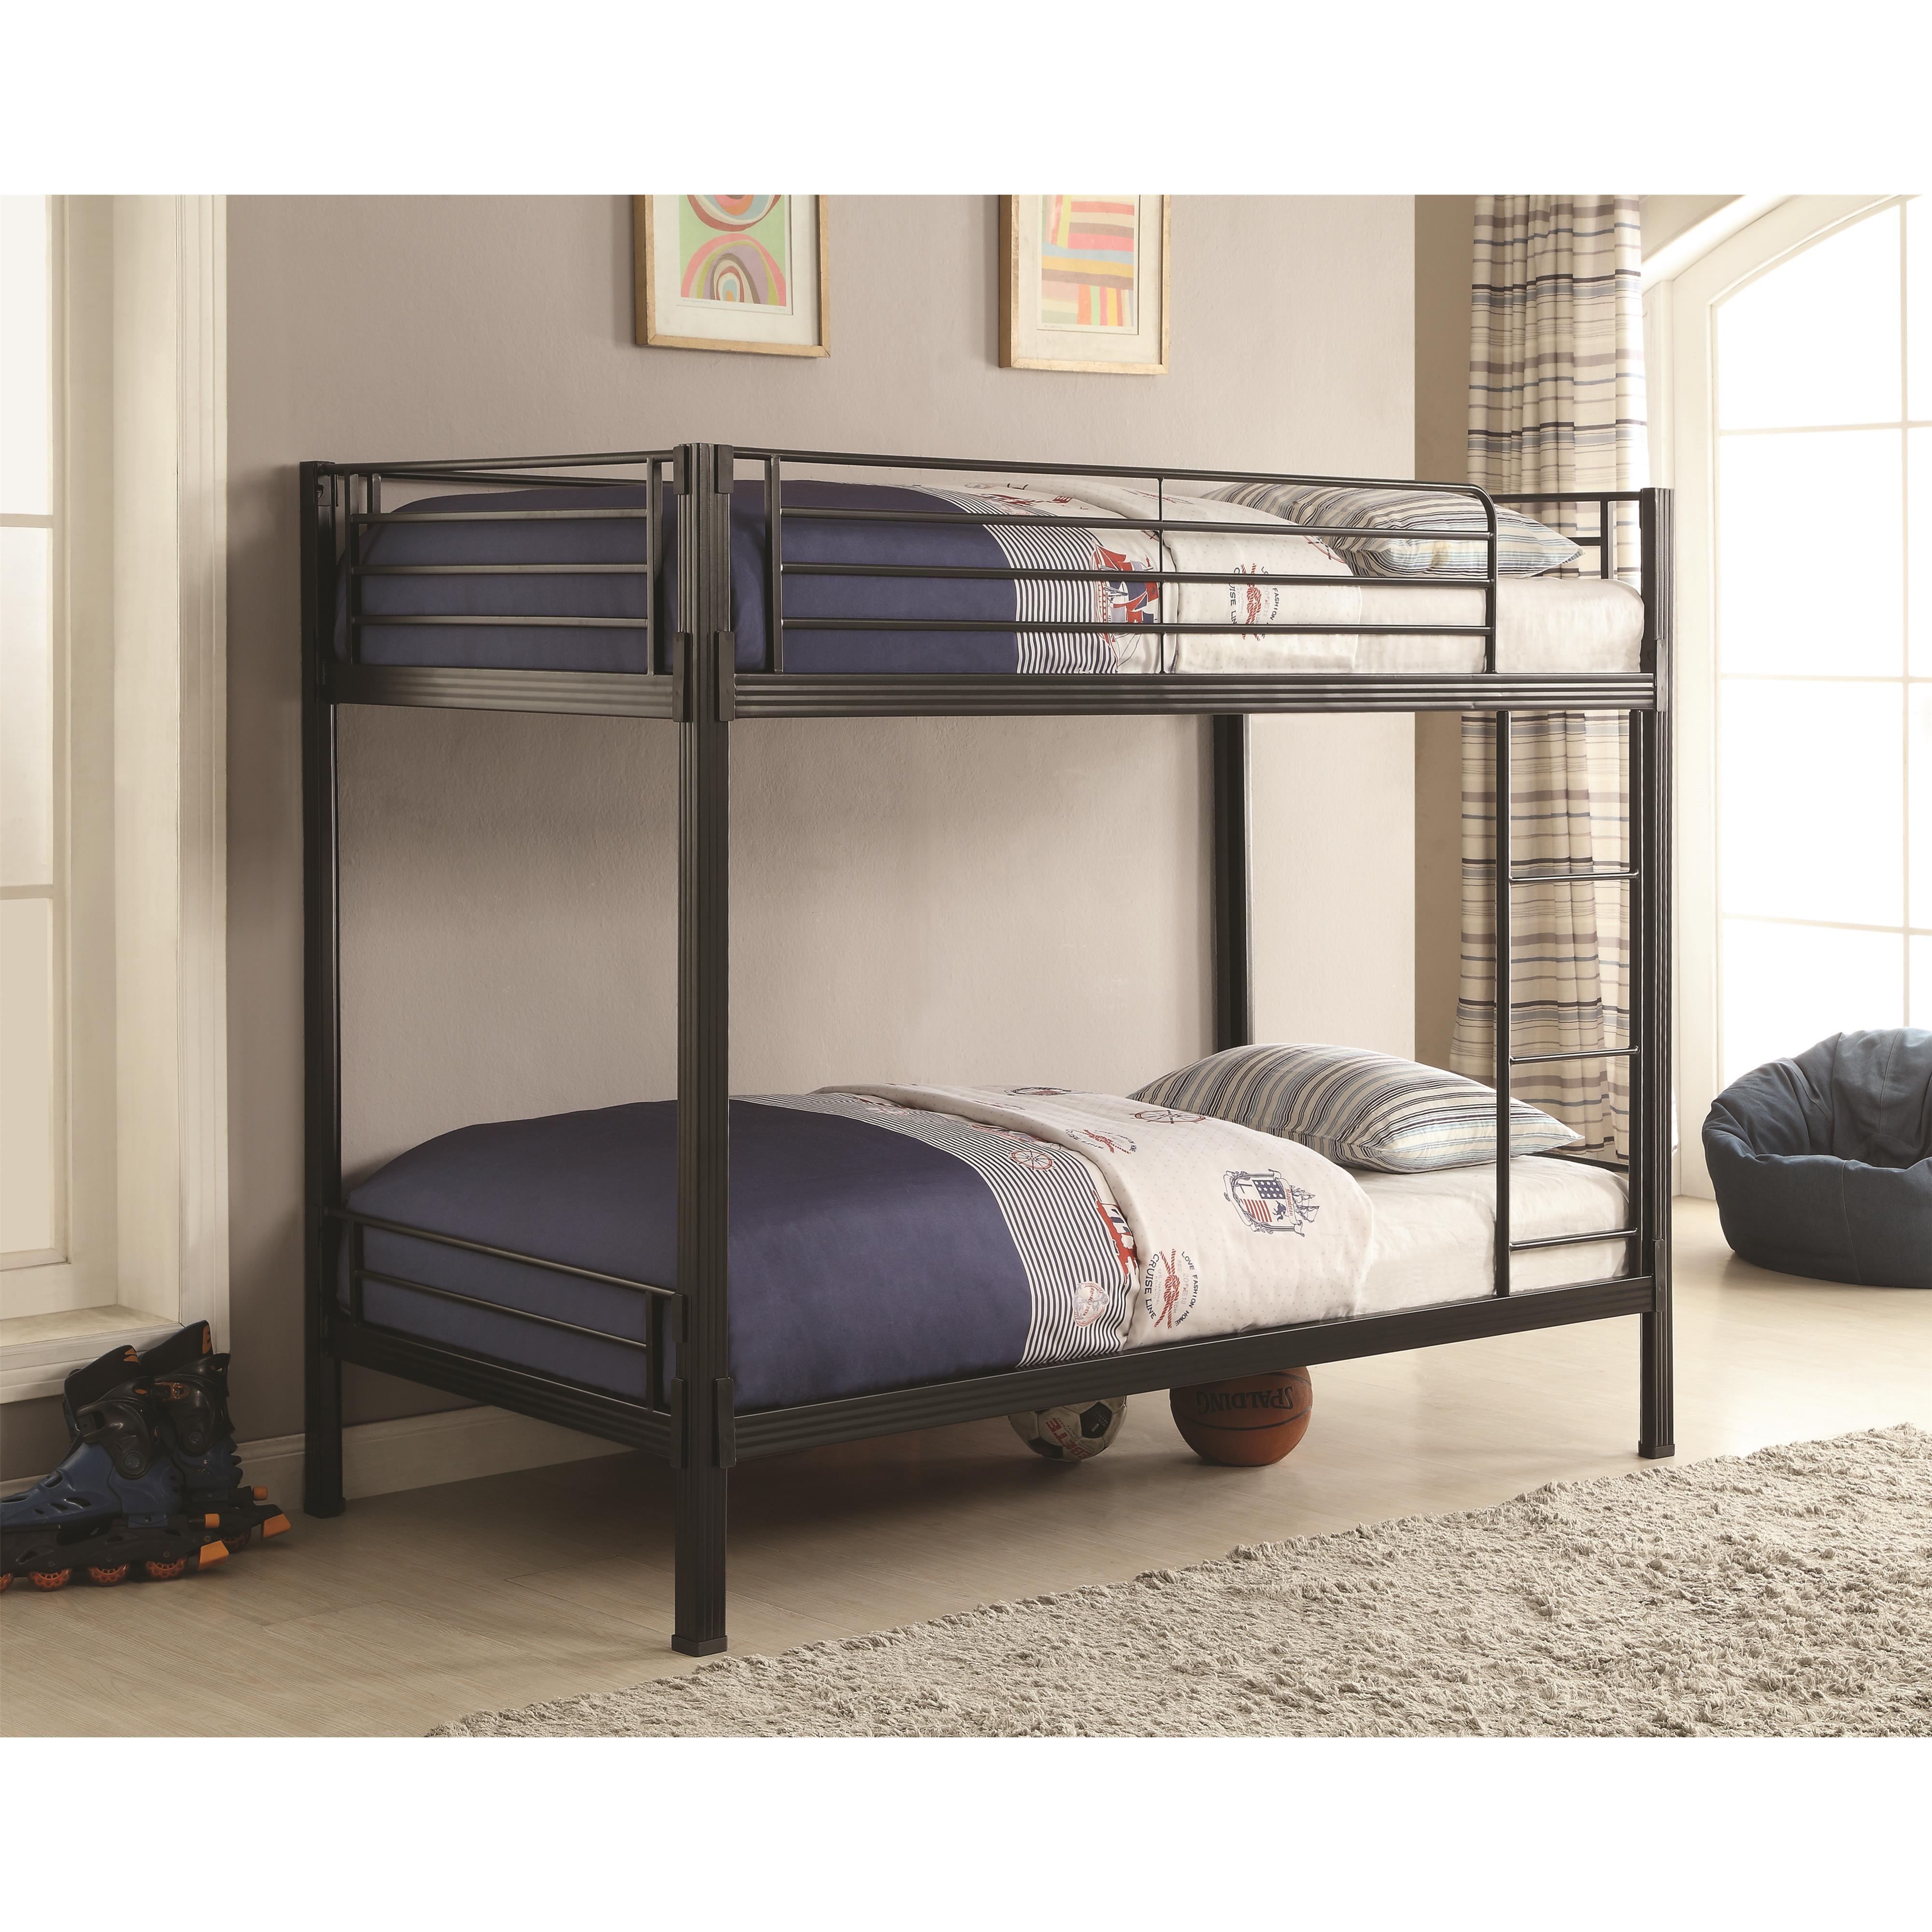 Coaster Bunks Bunk Bed - Item Number: 400067T